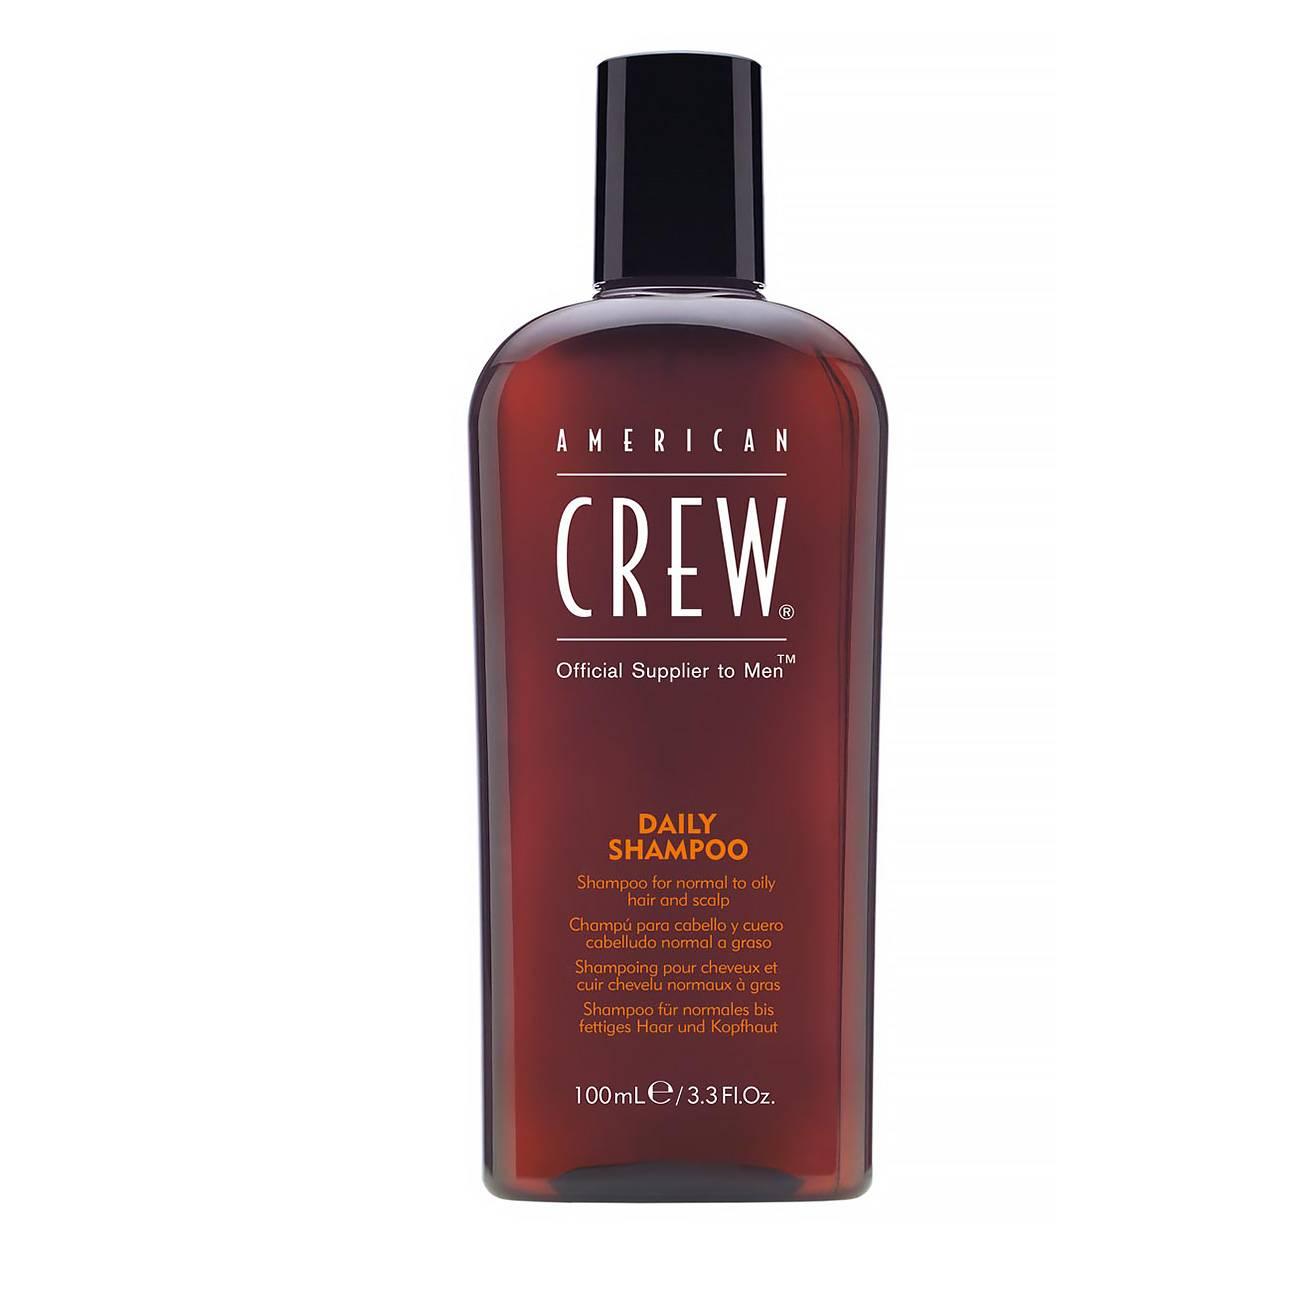 Daily Shampoo 100ml American Crew imagine 2021 bestvalue.eu